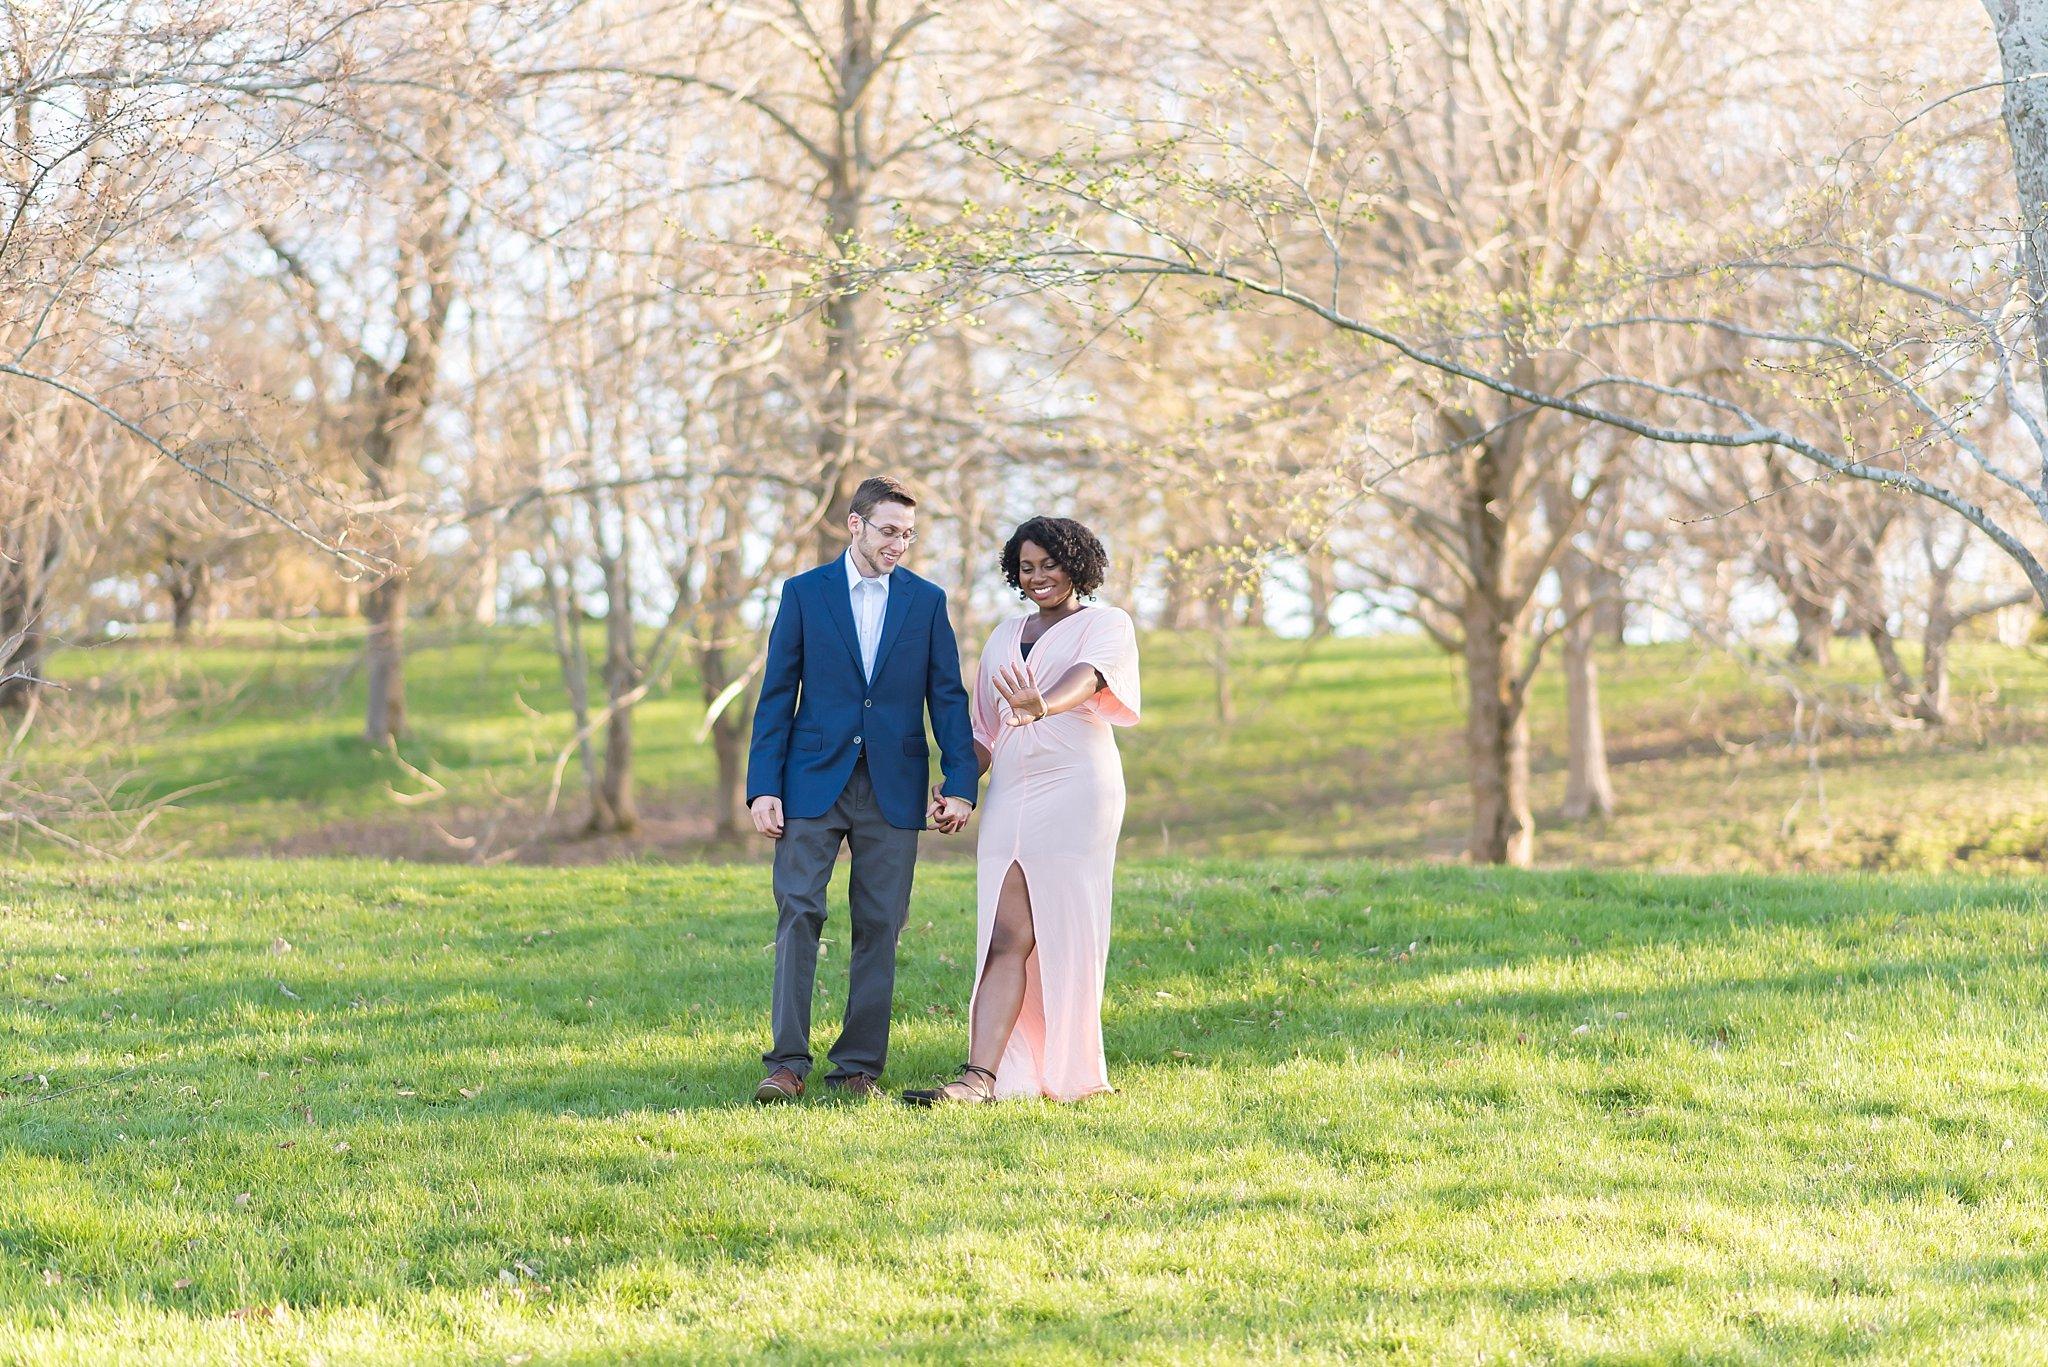 Engagement Photography in Boston.jpg